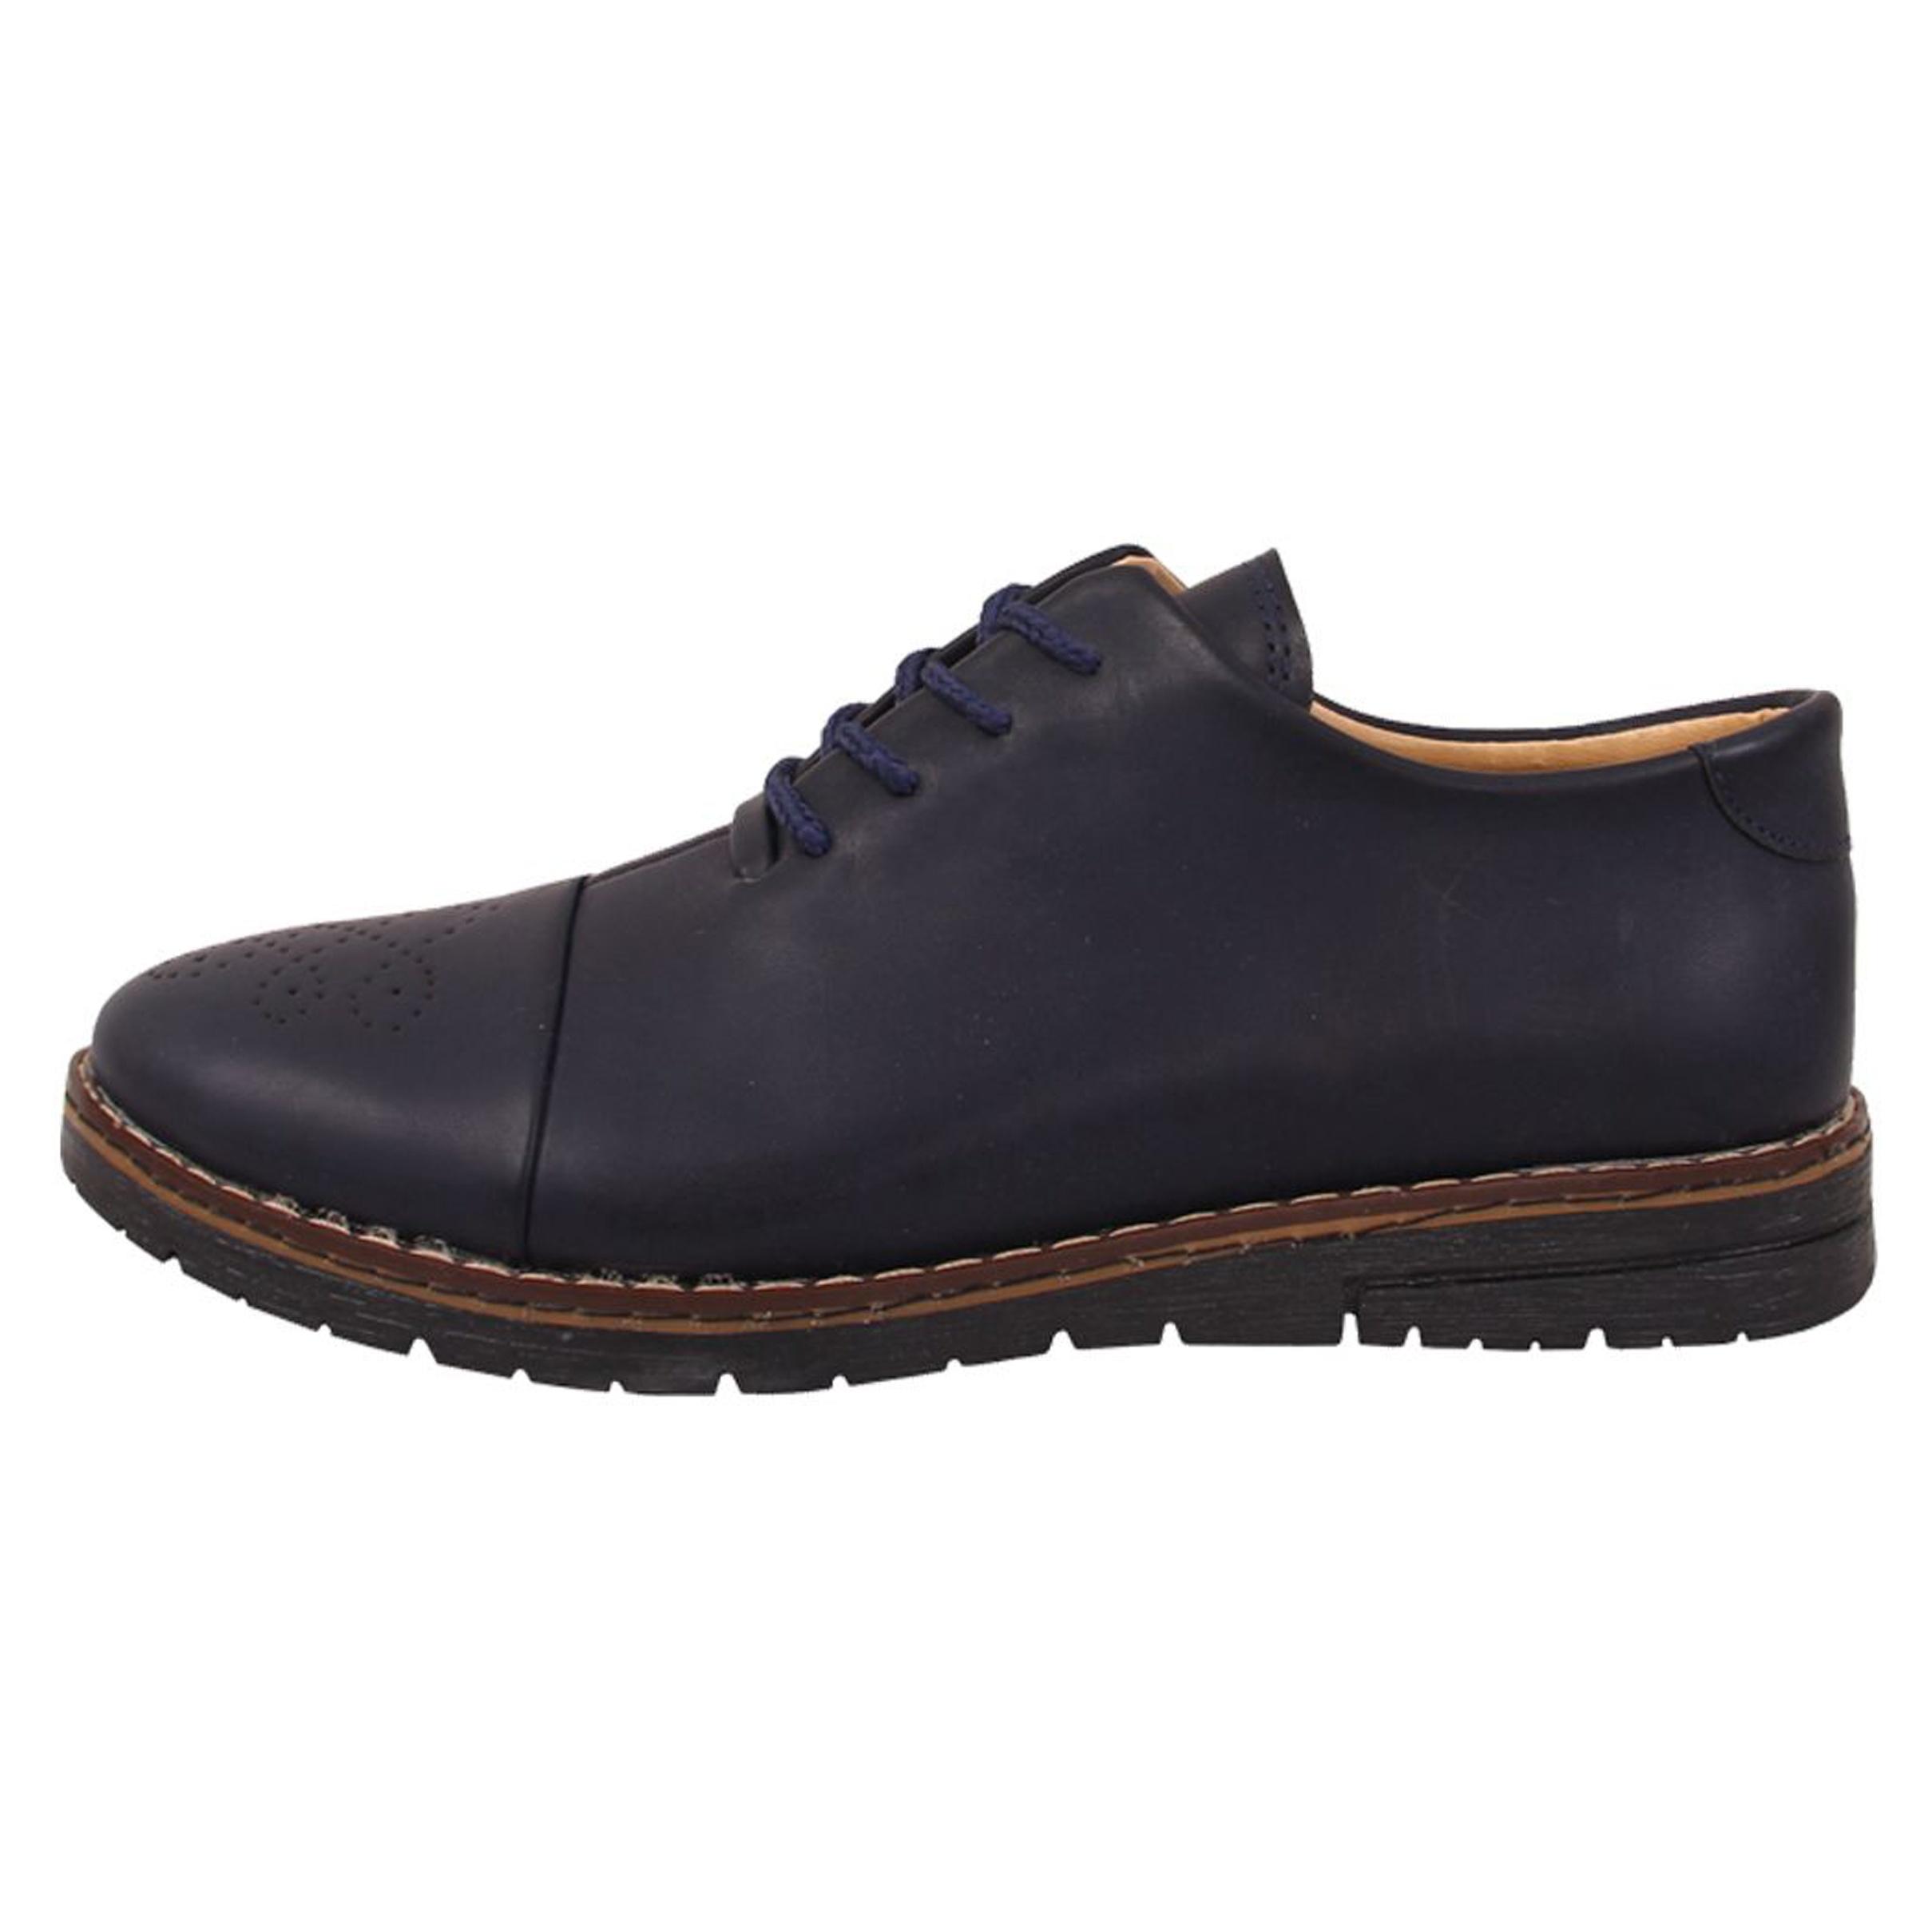 قیمت خرید کفش روزمره مردانه کد 13-2397050 اورجینال